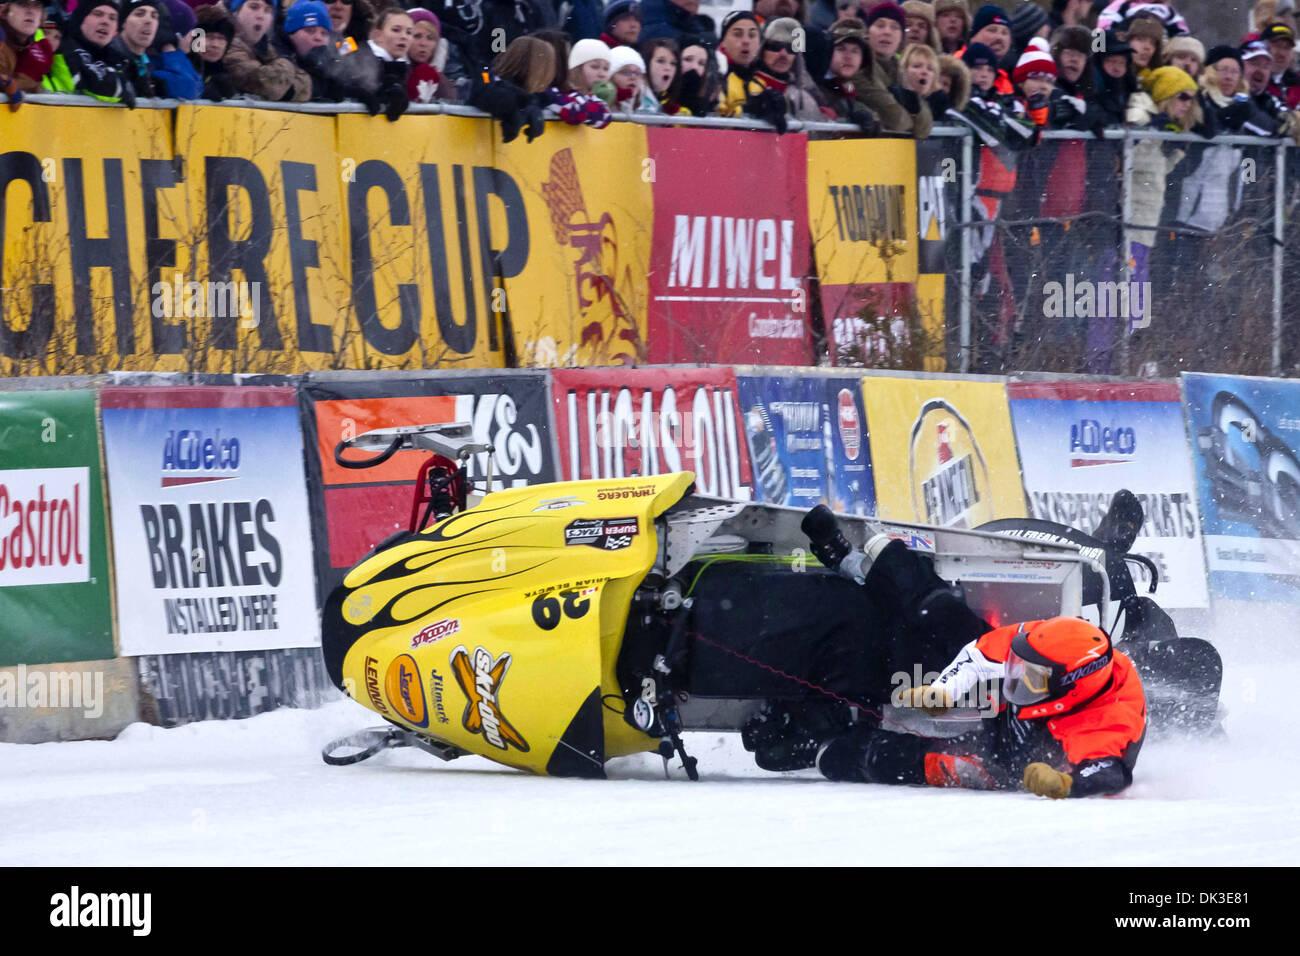 Feb. 27, 2011 - Eganville, Ontario, Canada - A crash between Brian Bewcyk(39) & Dustin Wahl(74) (Credit Image: © Leon Switzer/Southcreek Global/ZUMAPRESS.com) - Stock Image